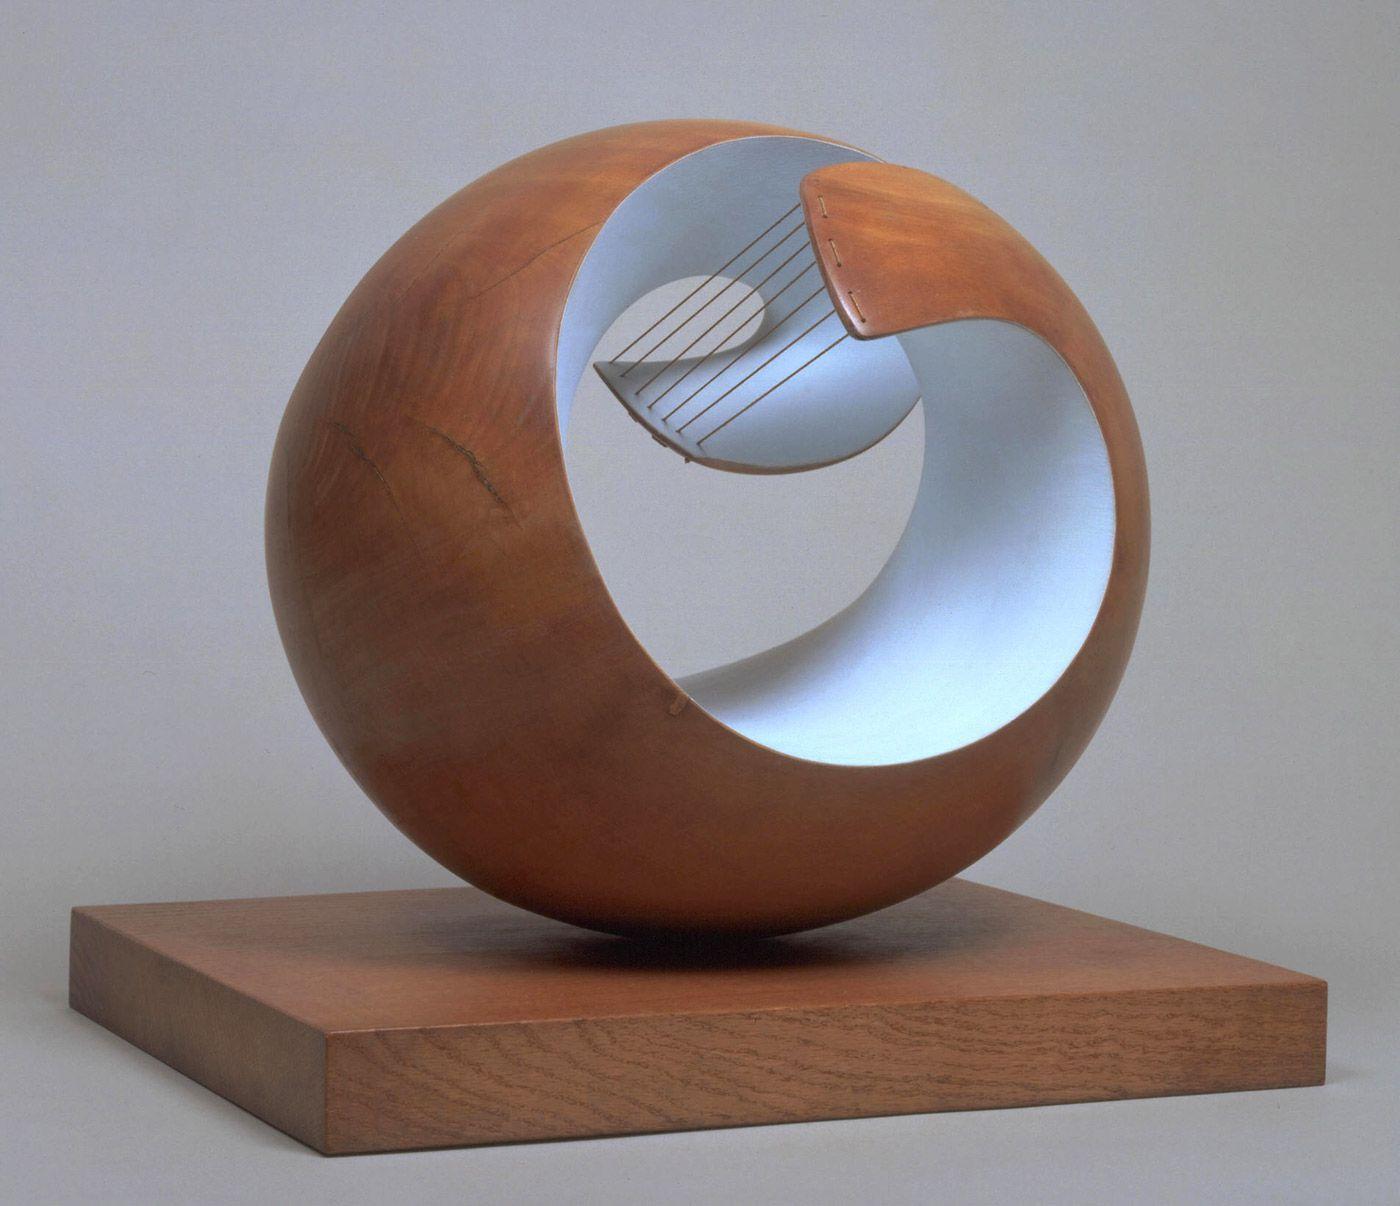 Exhibition: 'Barbara Hepworth: Sculpture for a Modern World' at Tate Britain, London. http://artblart.com/2015/10/21/exhibition-barbara-hepworth-sculpture-for-a-modern-world-at-tate-britain-london/ Art work: Barbara Hepworth. 'Pelagos' 1946